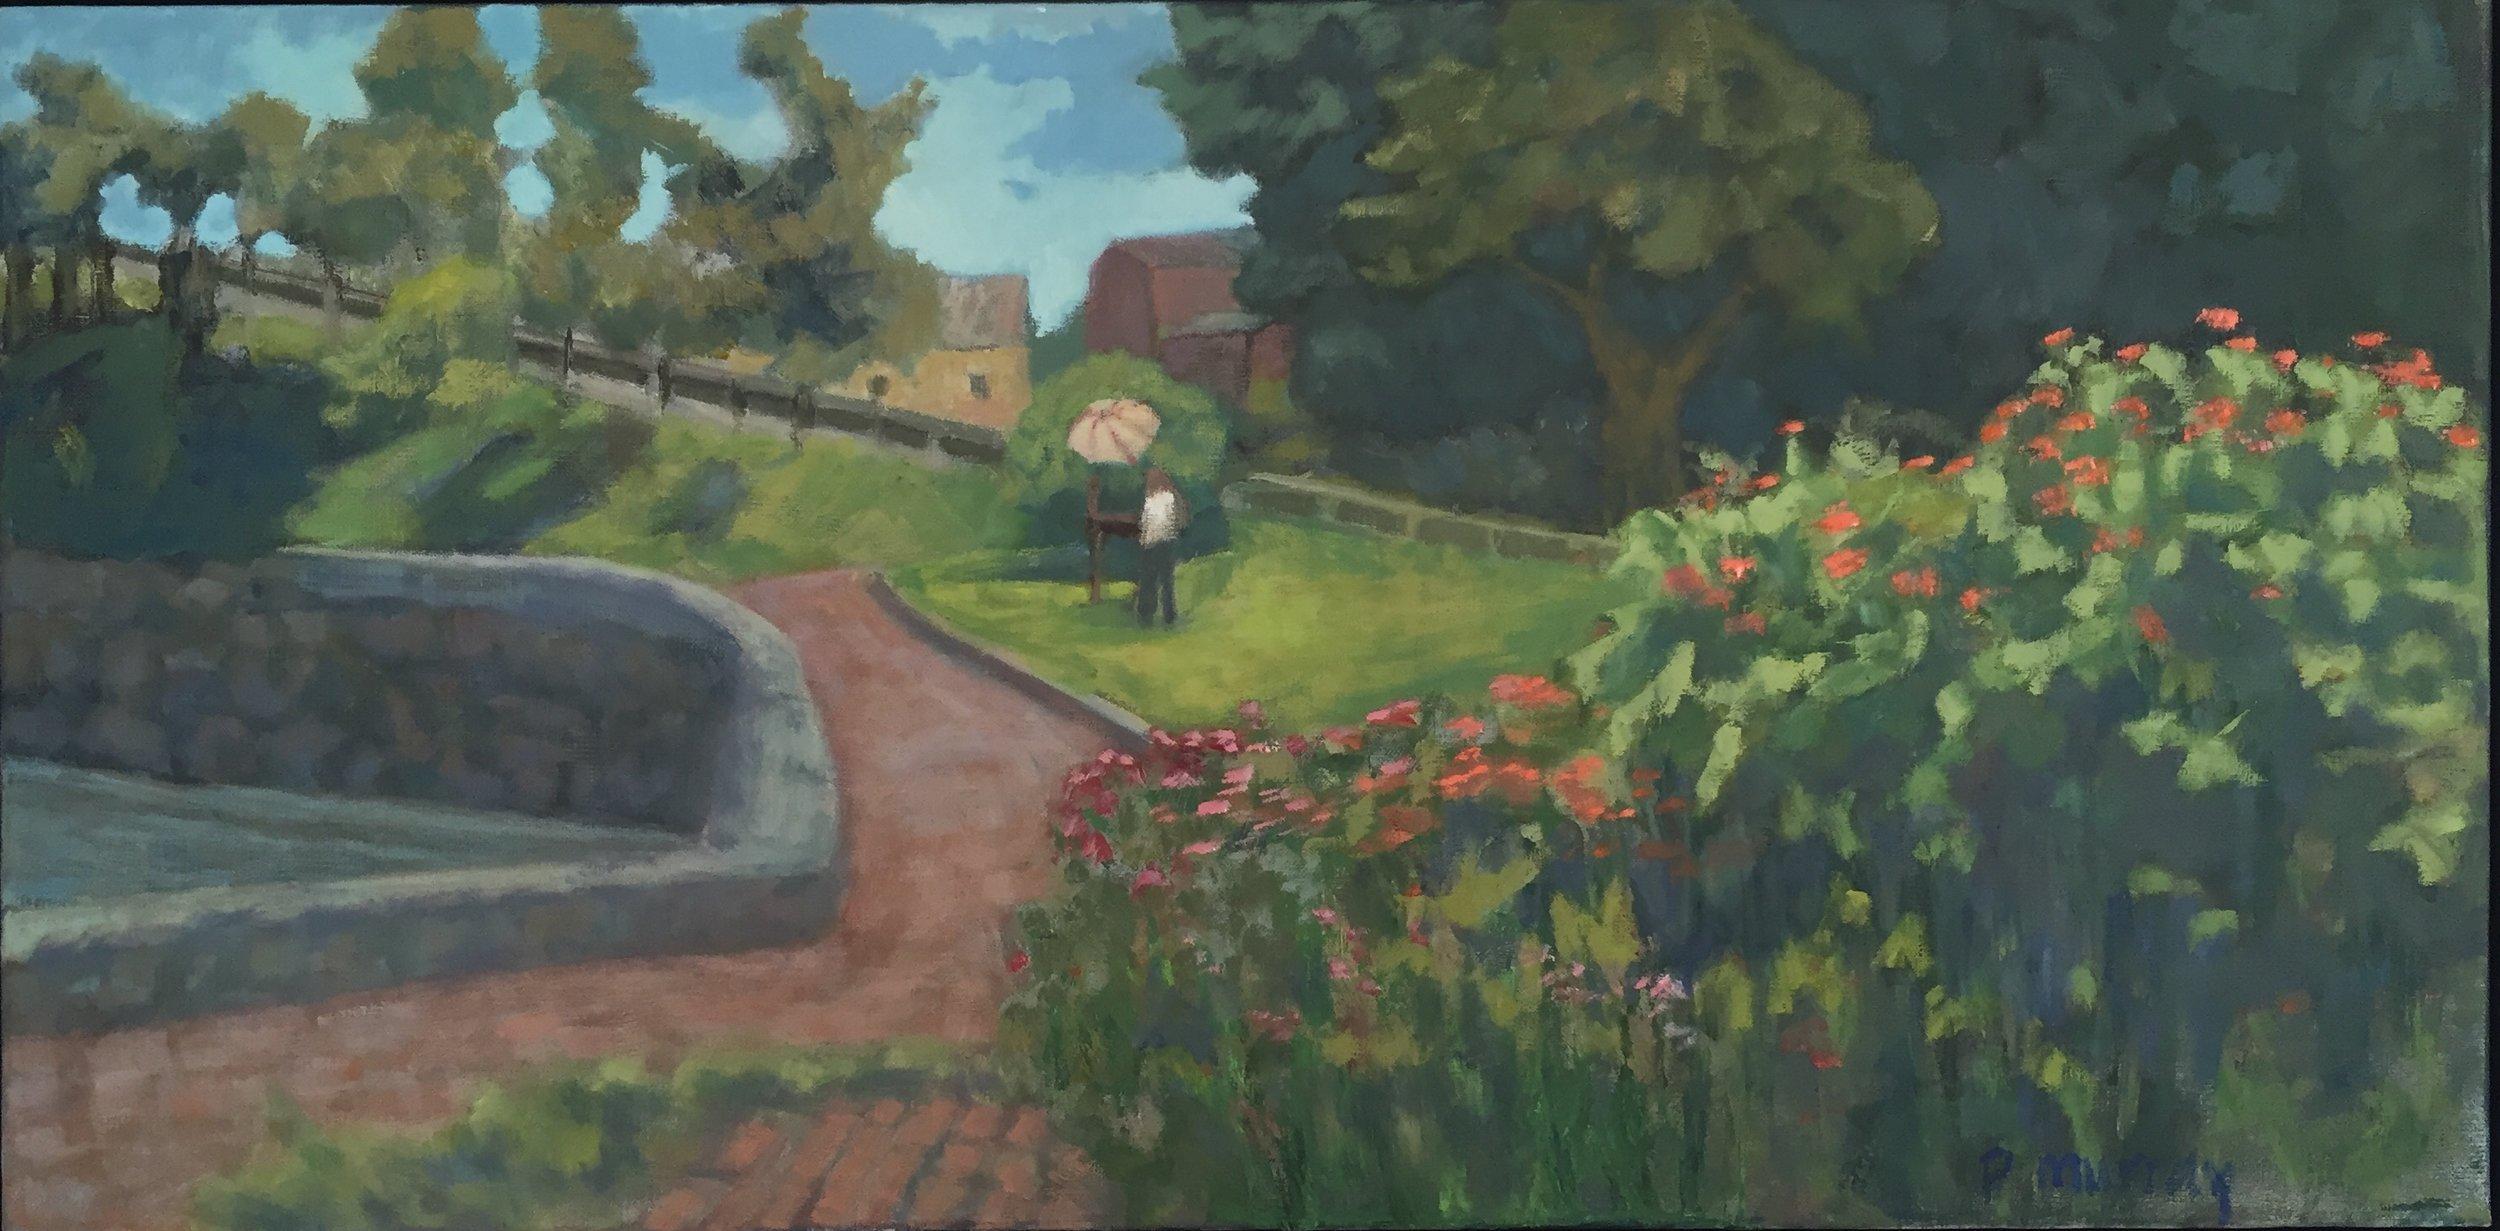 Painter in Prescott Park, Portsmouth, NH